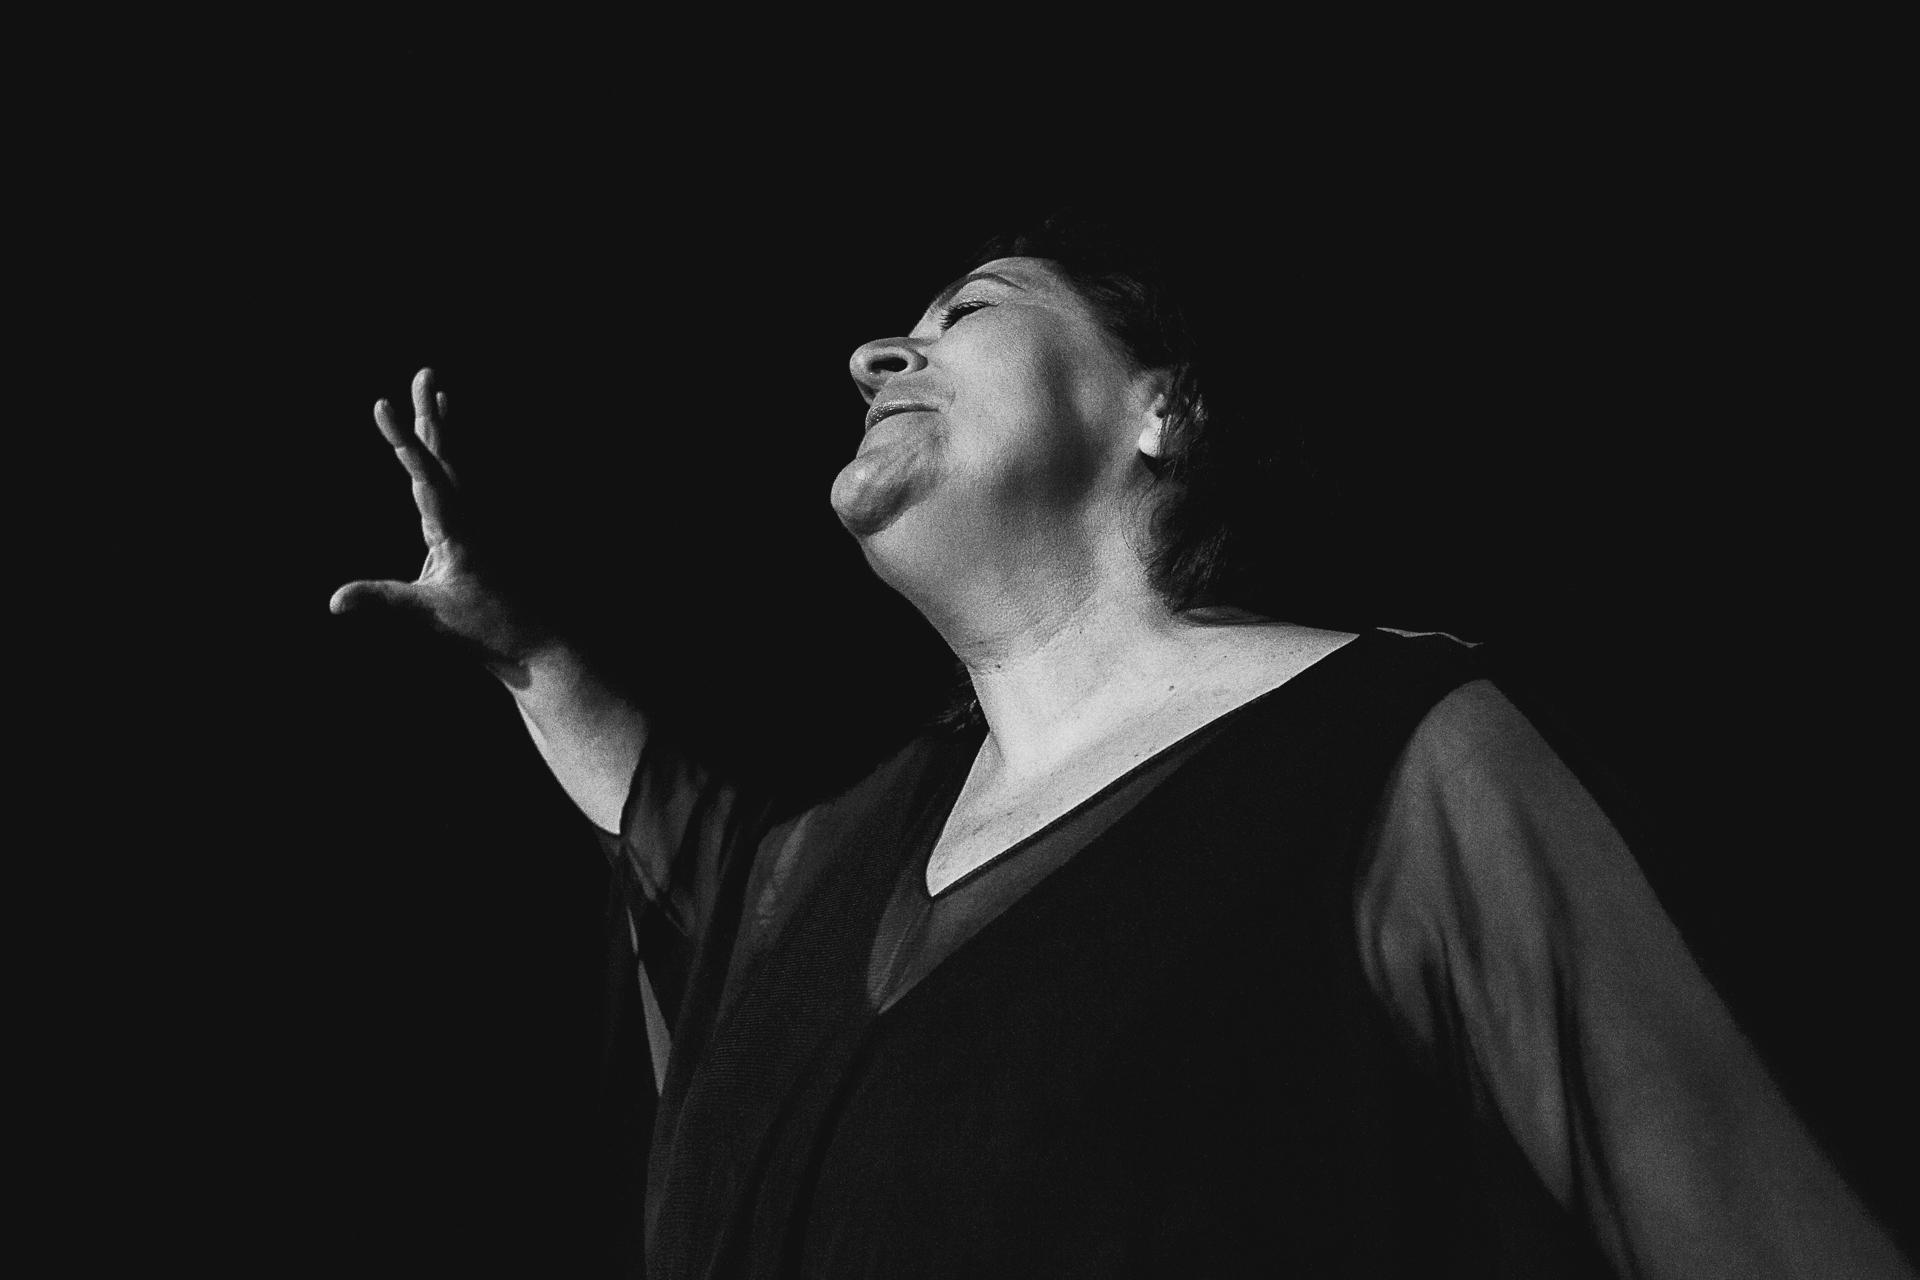 Doroteia Serafim outras historias assim Photography Fotografia On Stage Theatre Teatro bonjourmolotov Andre Gigante 10